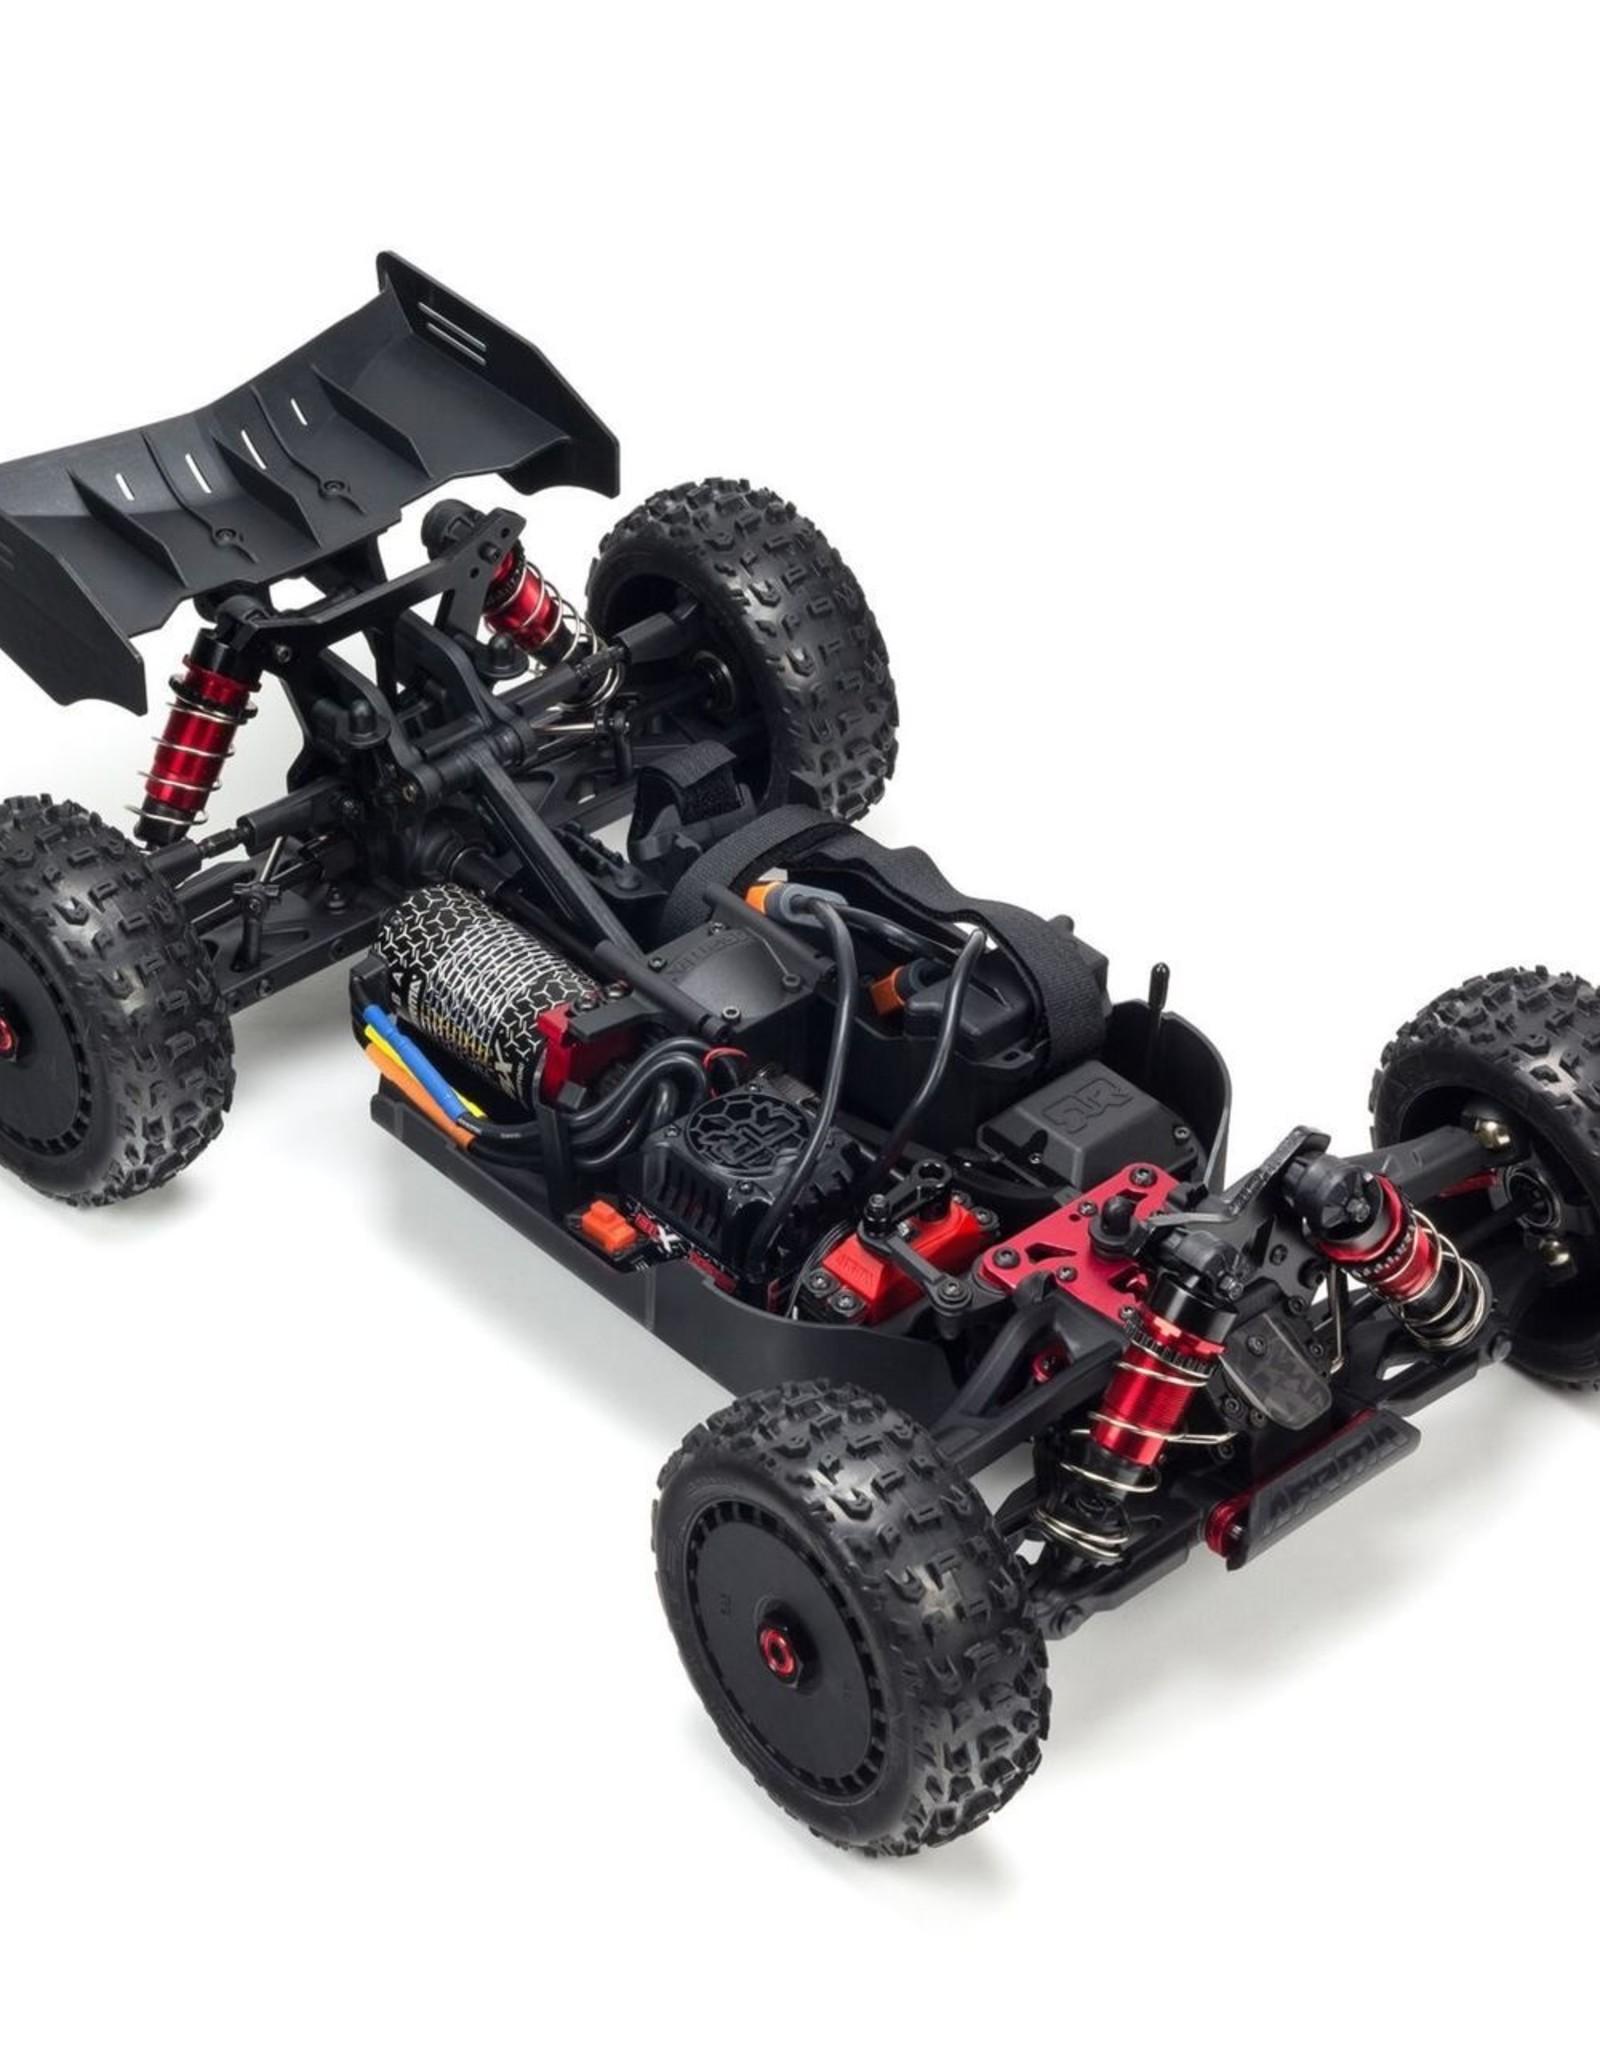 Arrma Arrma Typhon 6S BLX 4WD Red/Grey